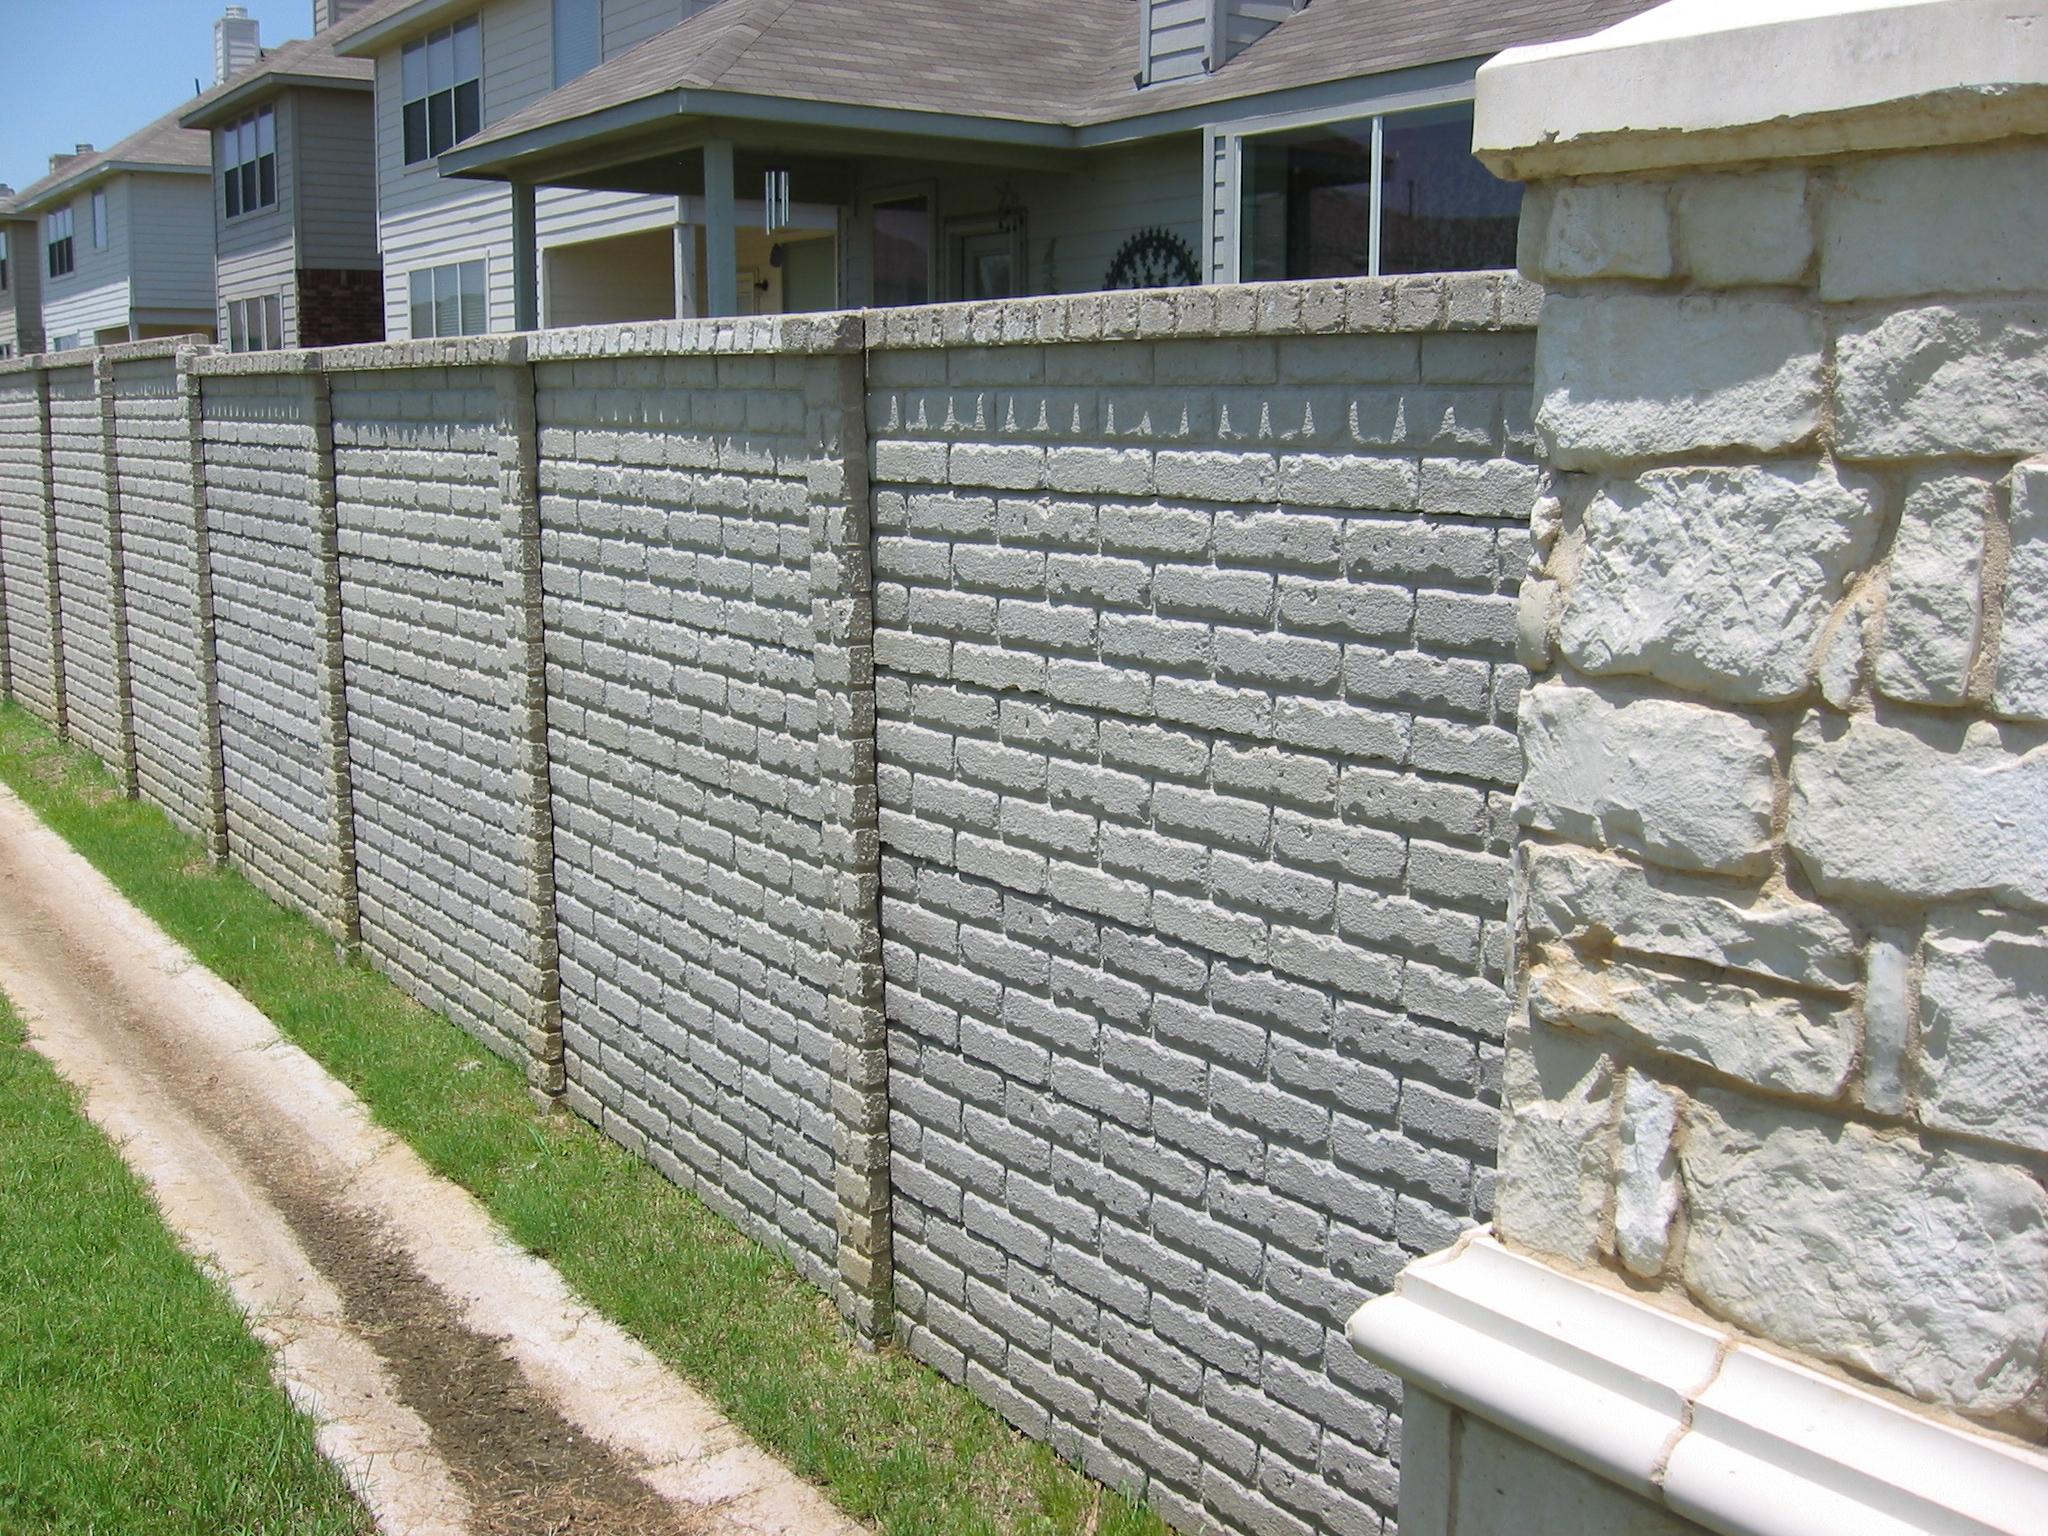 OldBrick Precast Fence Fort Worth TX.JPG